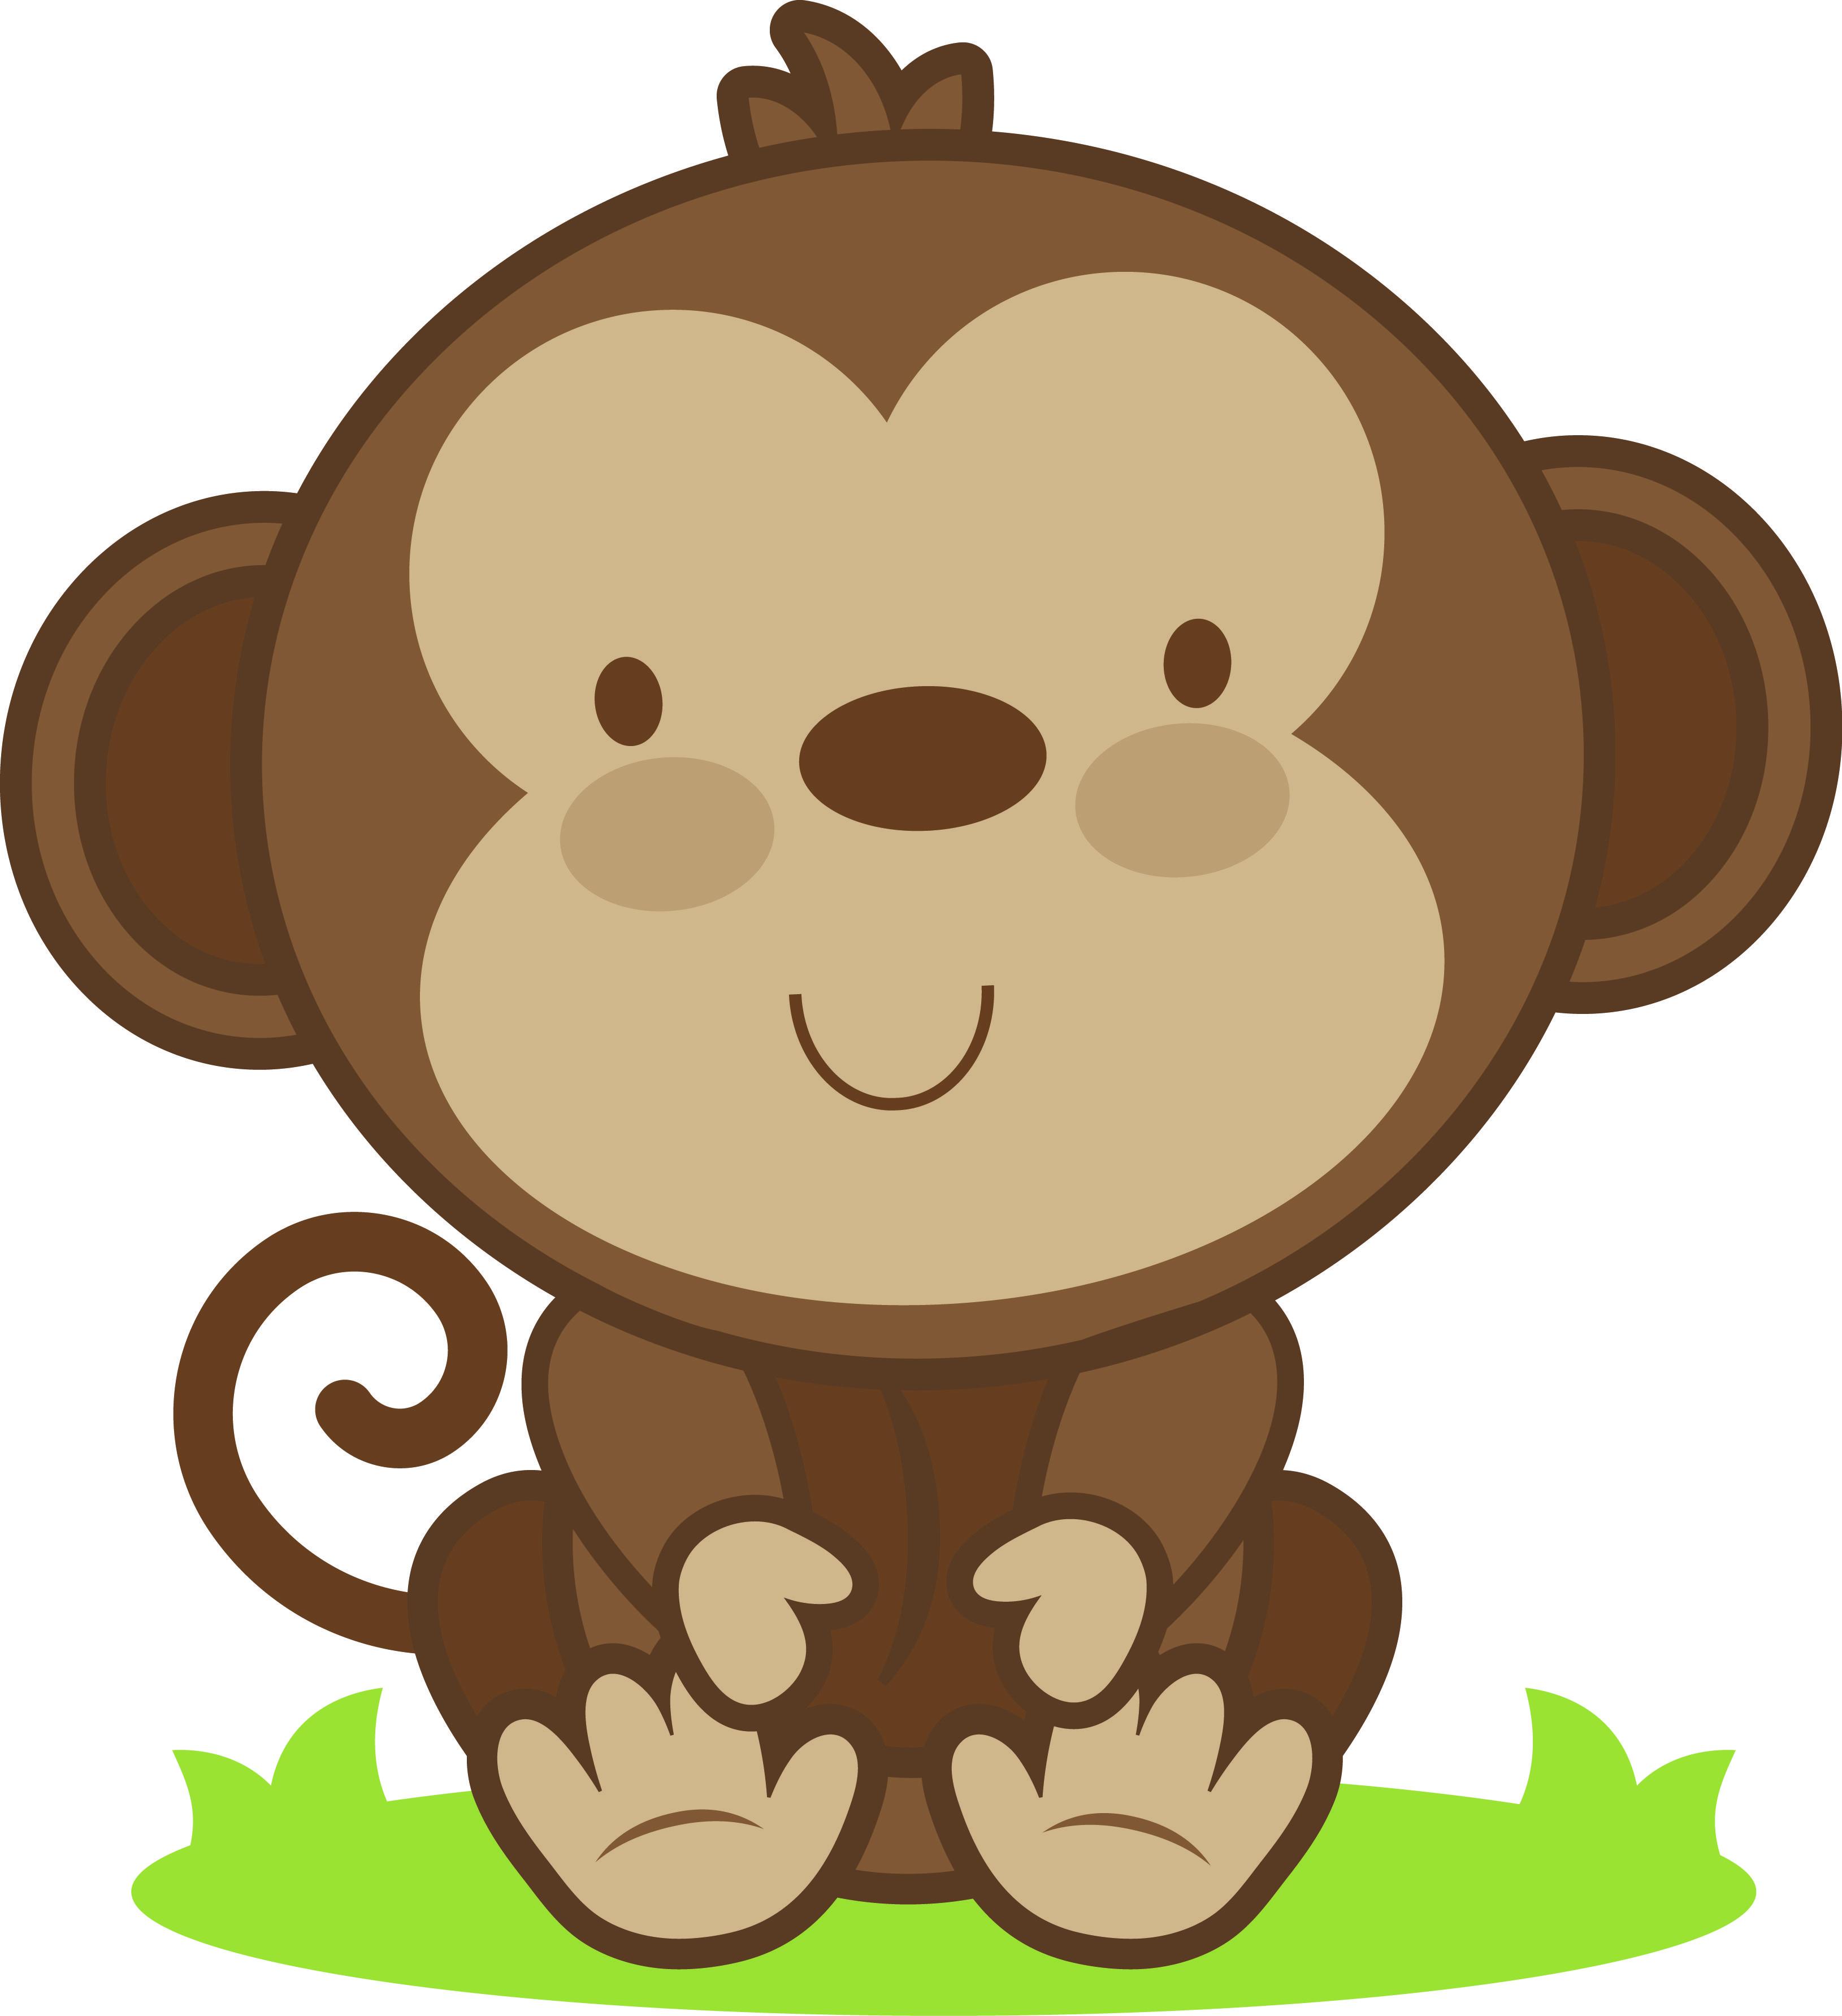 3259x3567 Cute Baby Monkey Clipart A0e8fb585efd6d731e513e26e93ff725